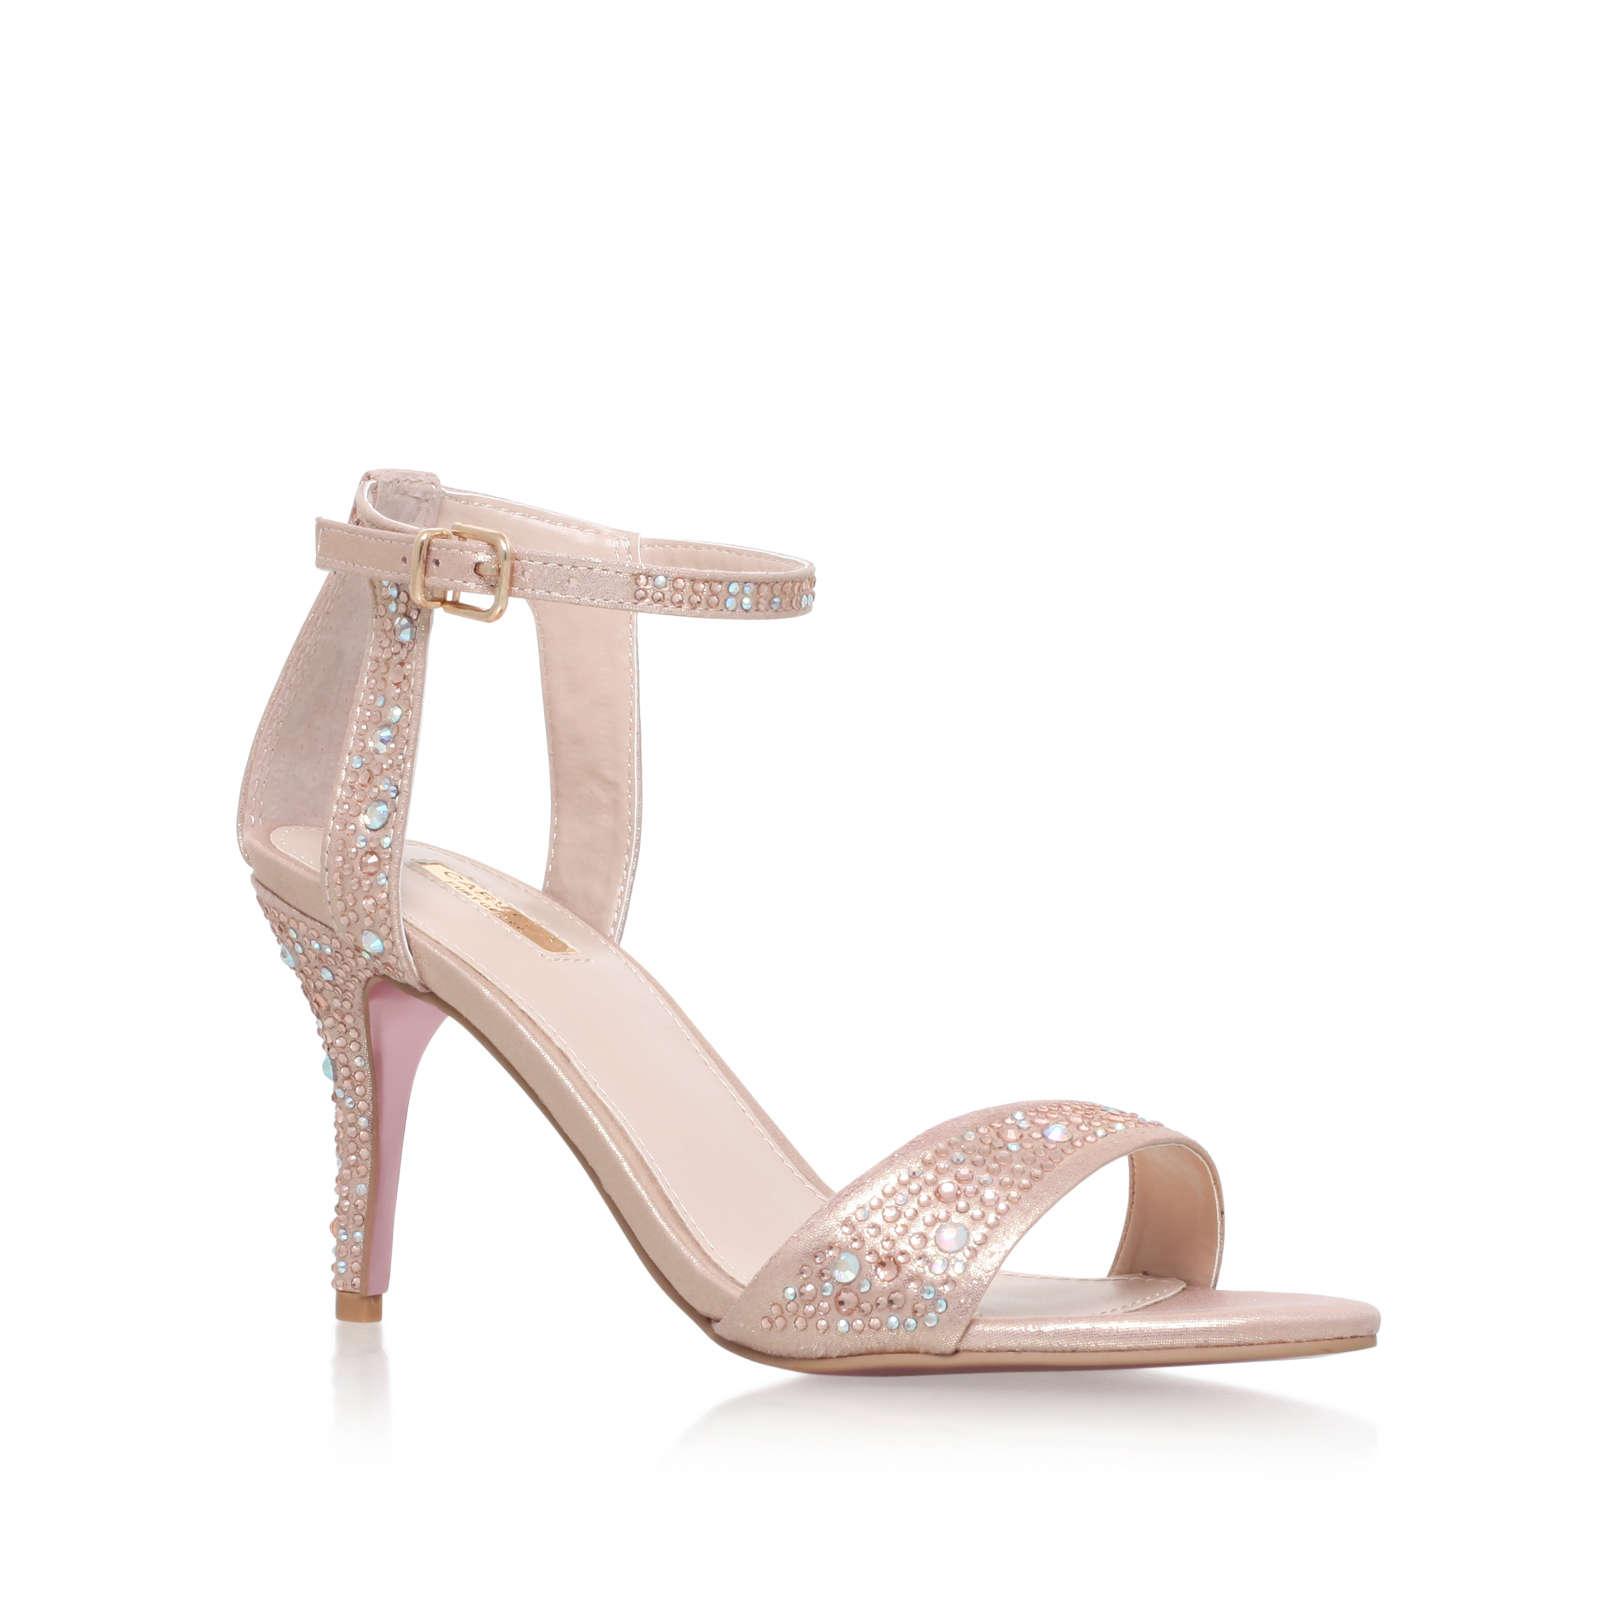 KOLLUDE Carvela Kollude Pink Mid Heel Sandals by CARVELA KURT GEIGER